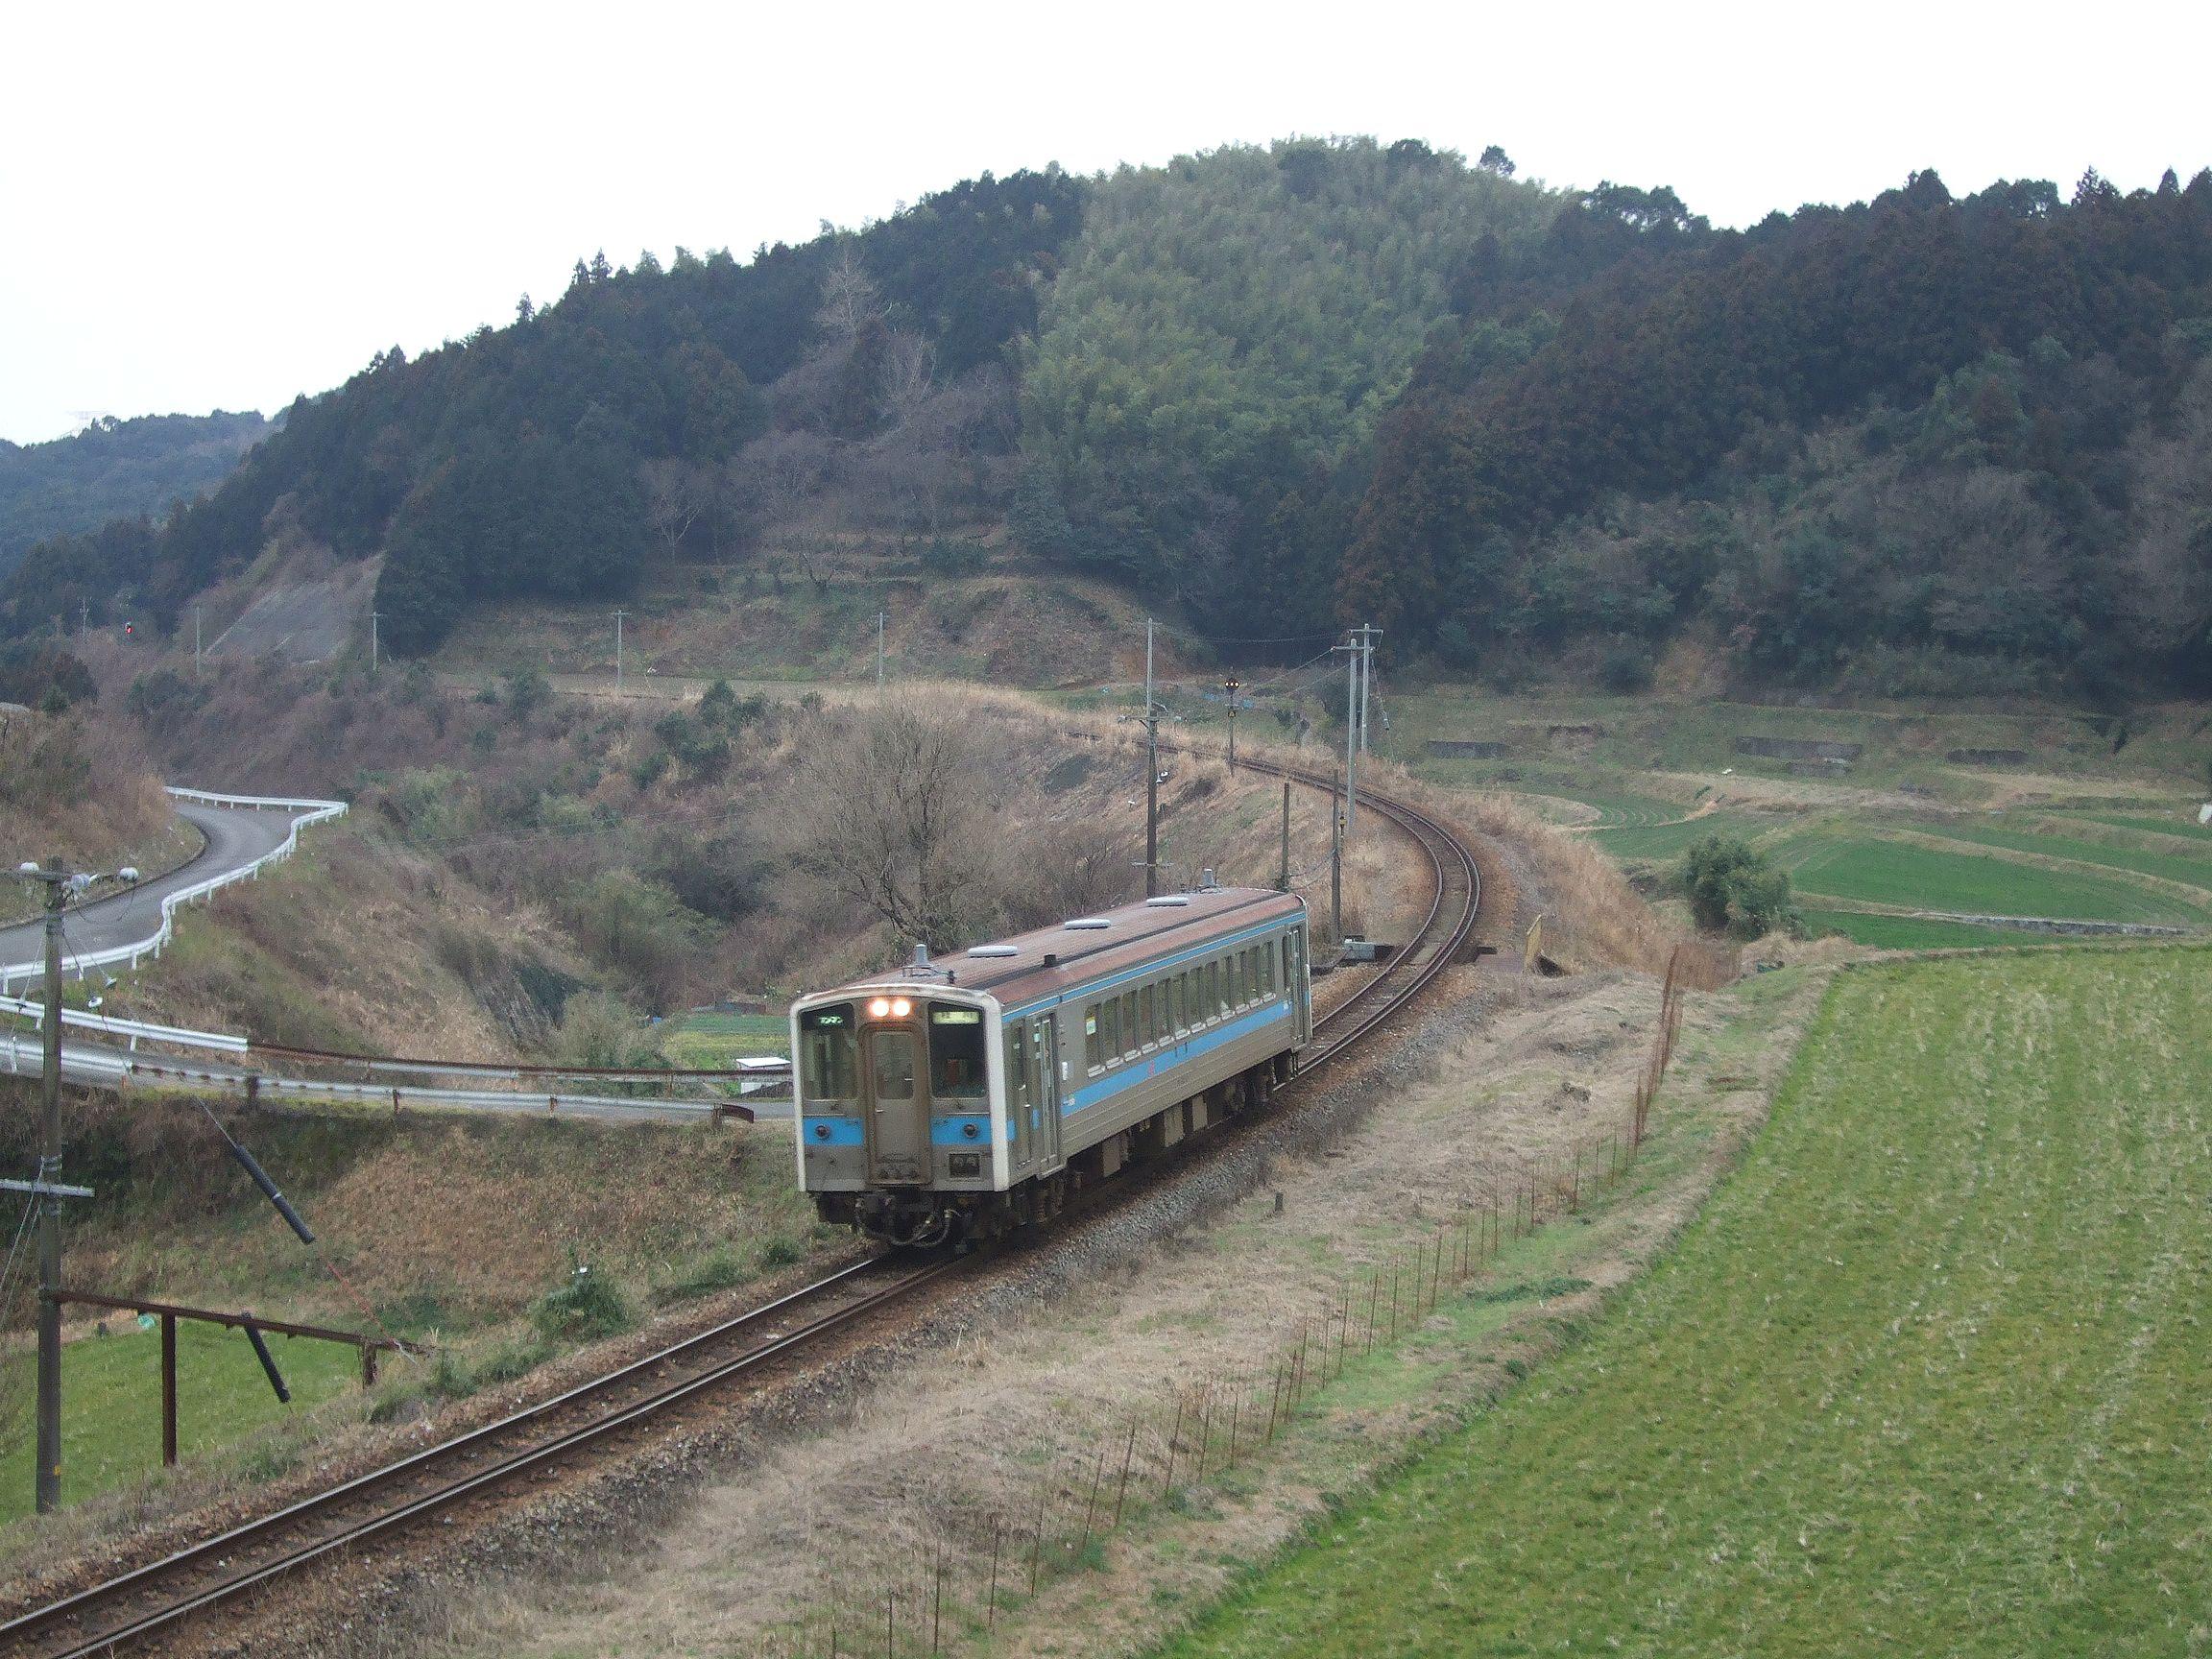 https://upload.wikimedia.org/wikipedia/commons/4/4f/JRKyushu_DMU_kiha31_at_Hiyamizu_pass.jpg